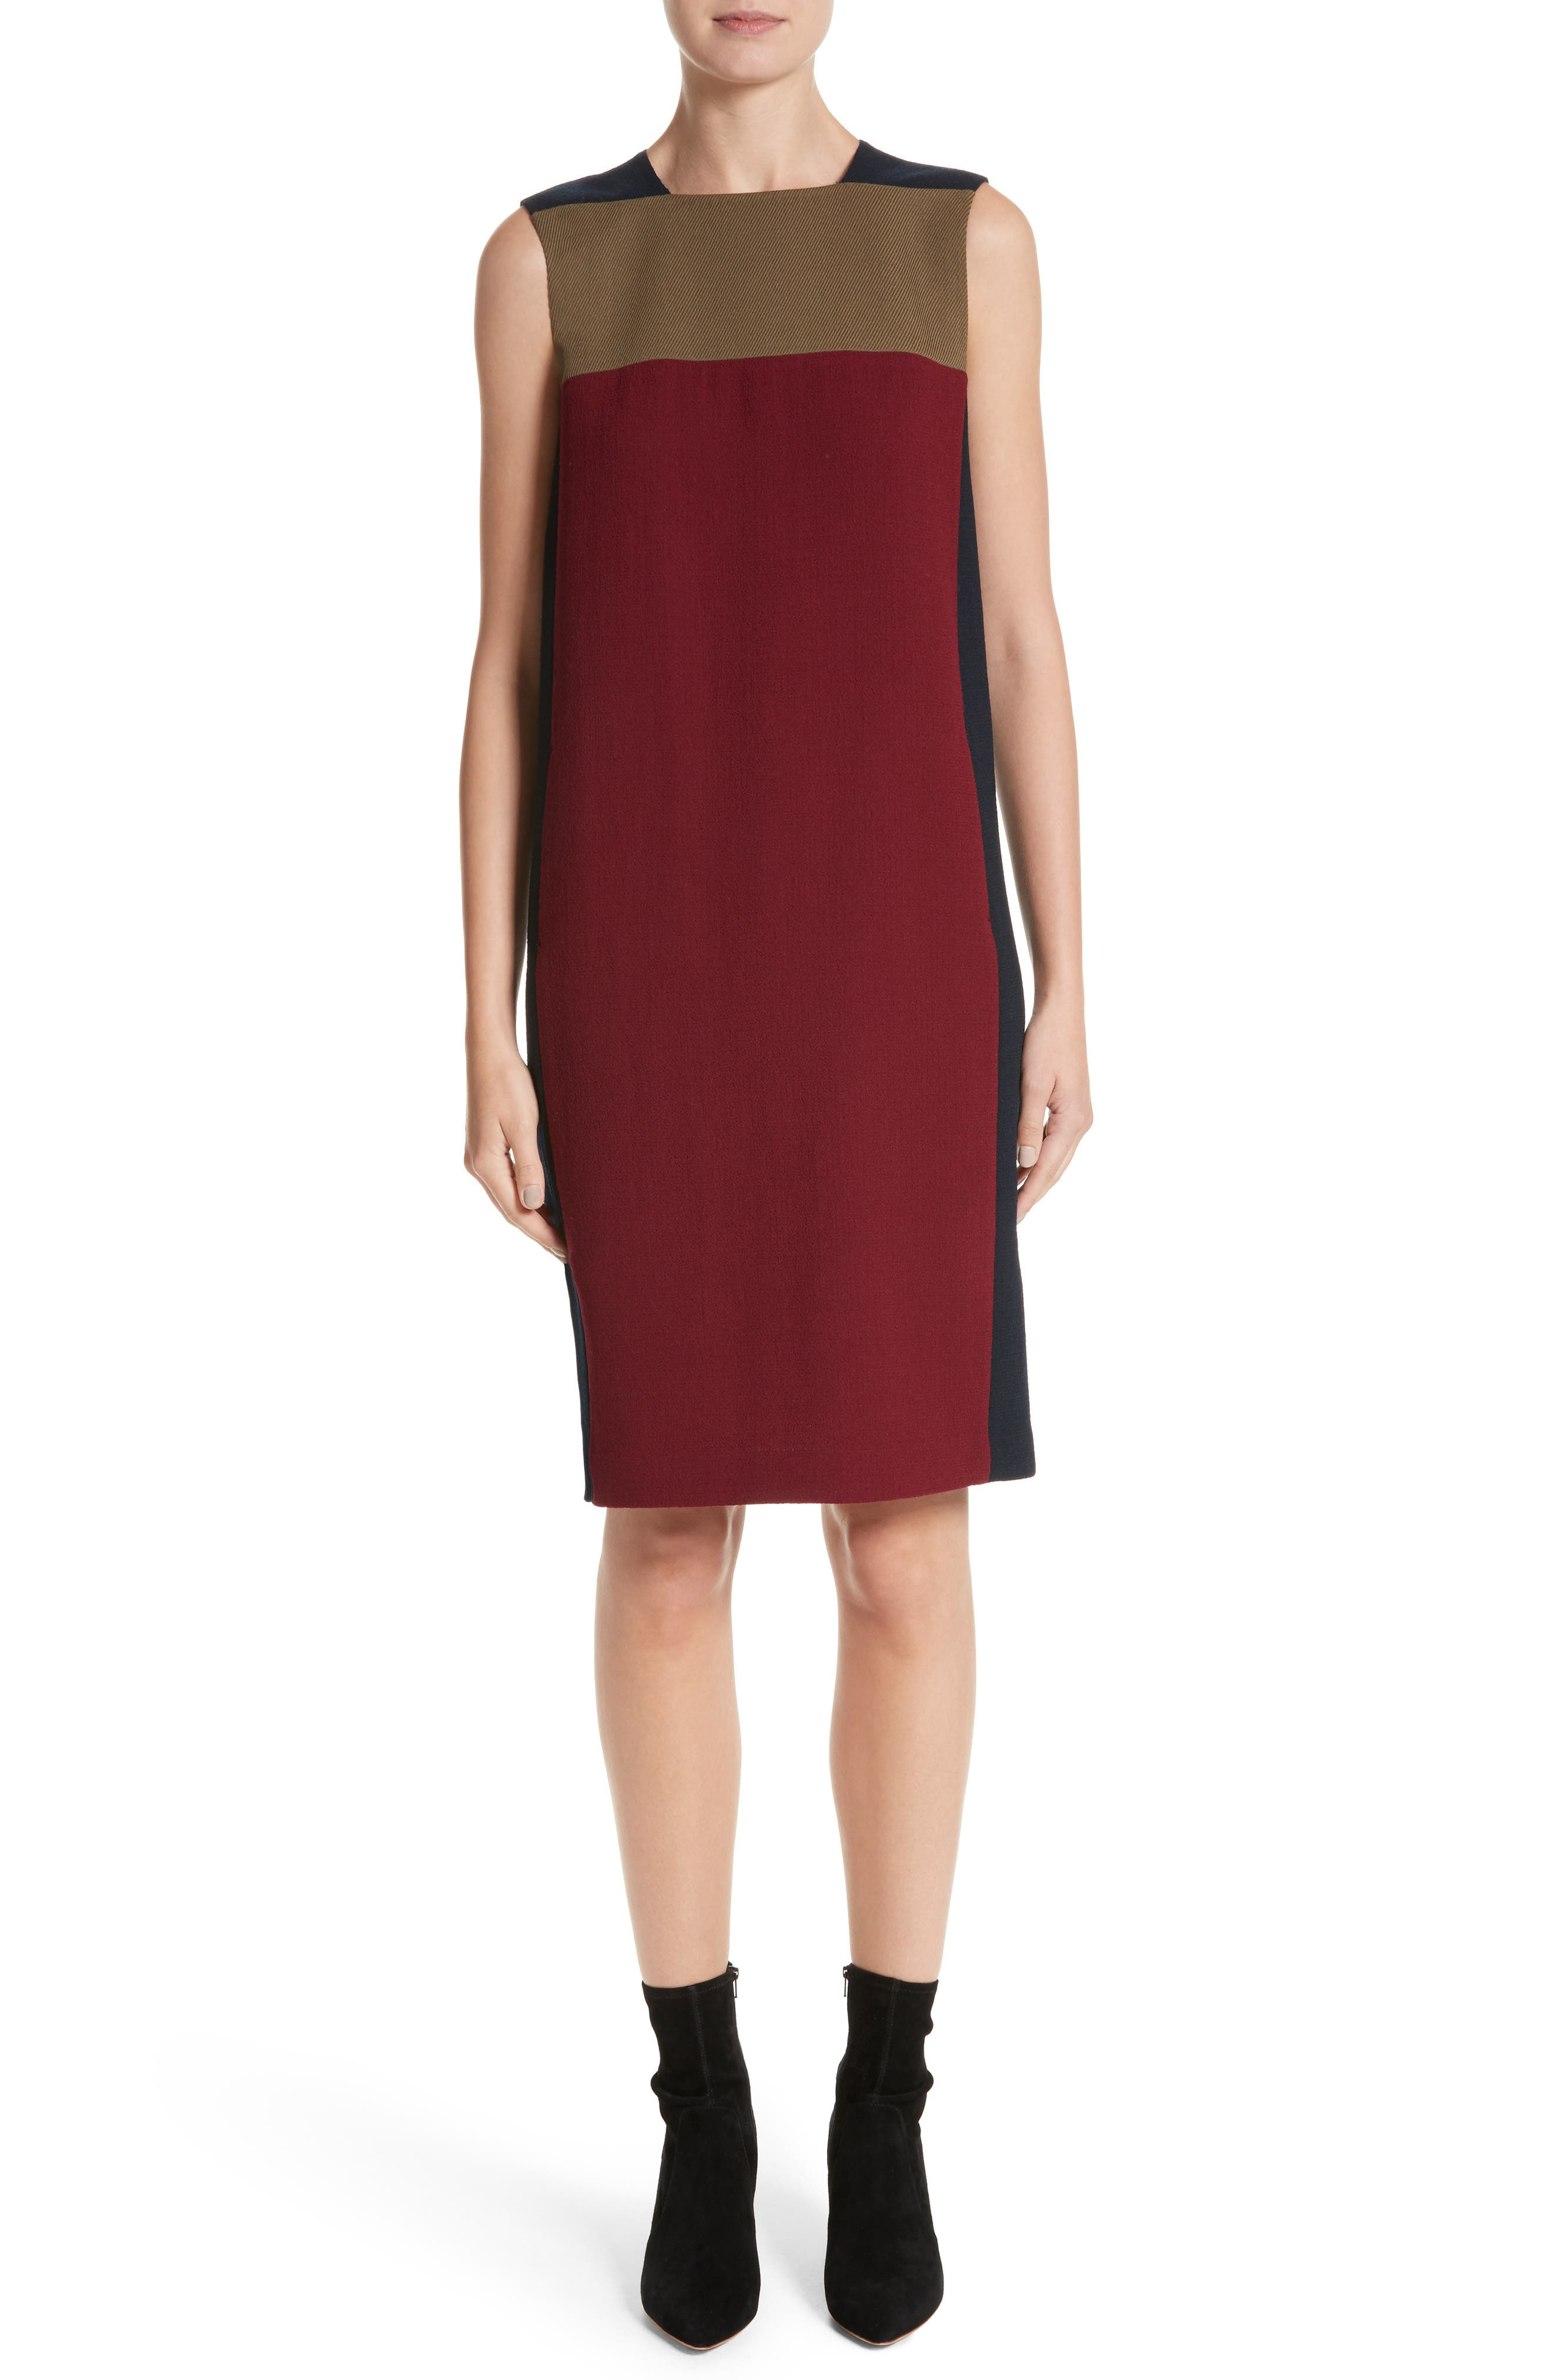 Lafayette 148 New York Zandra Colorblock Nouveau Crepe Dress